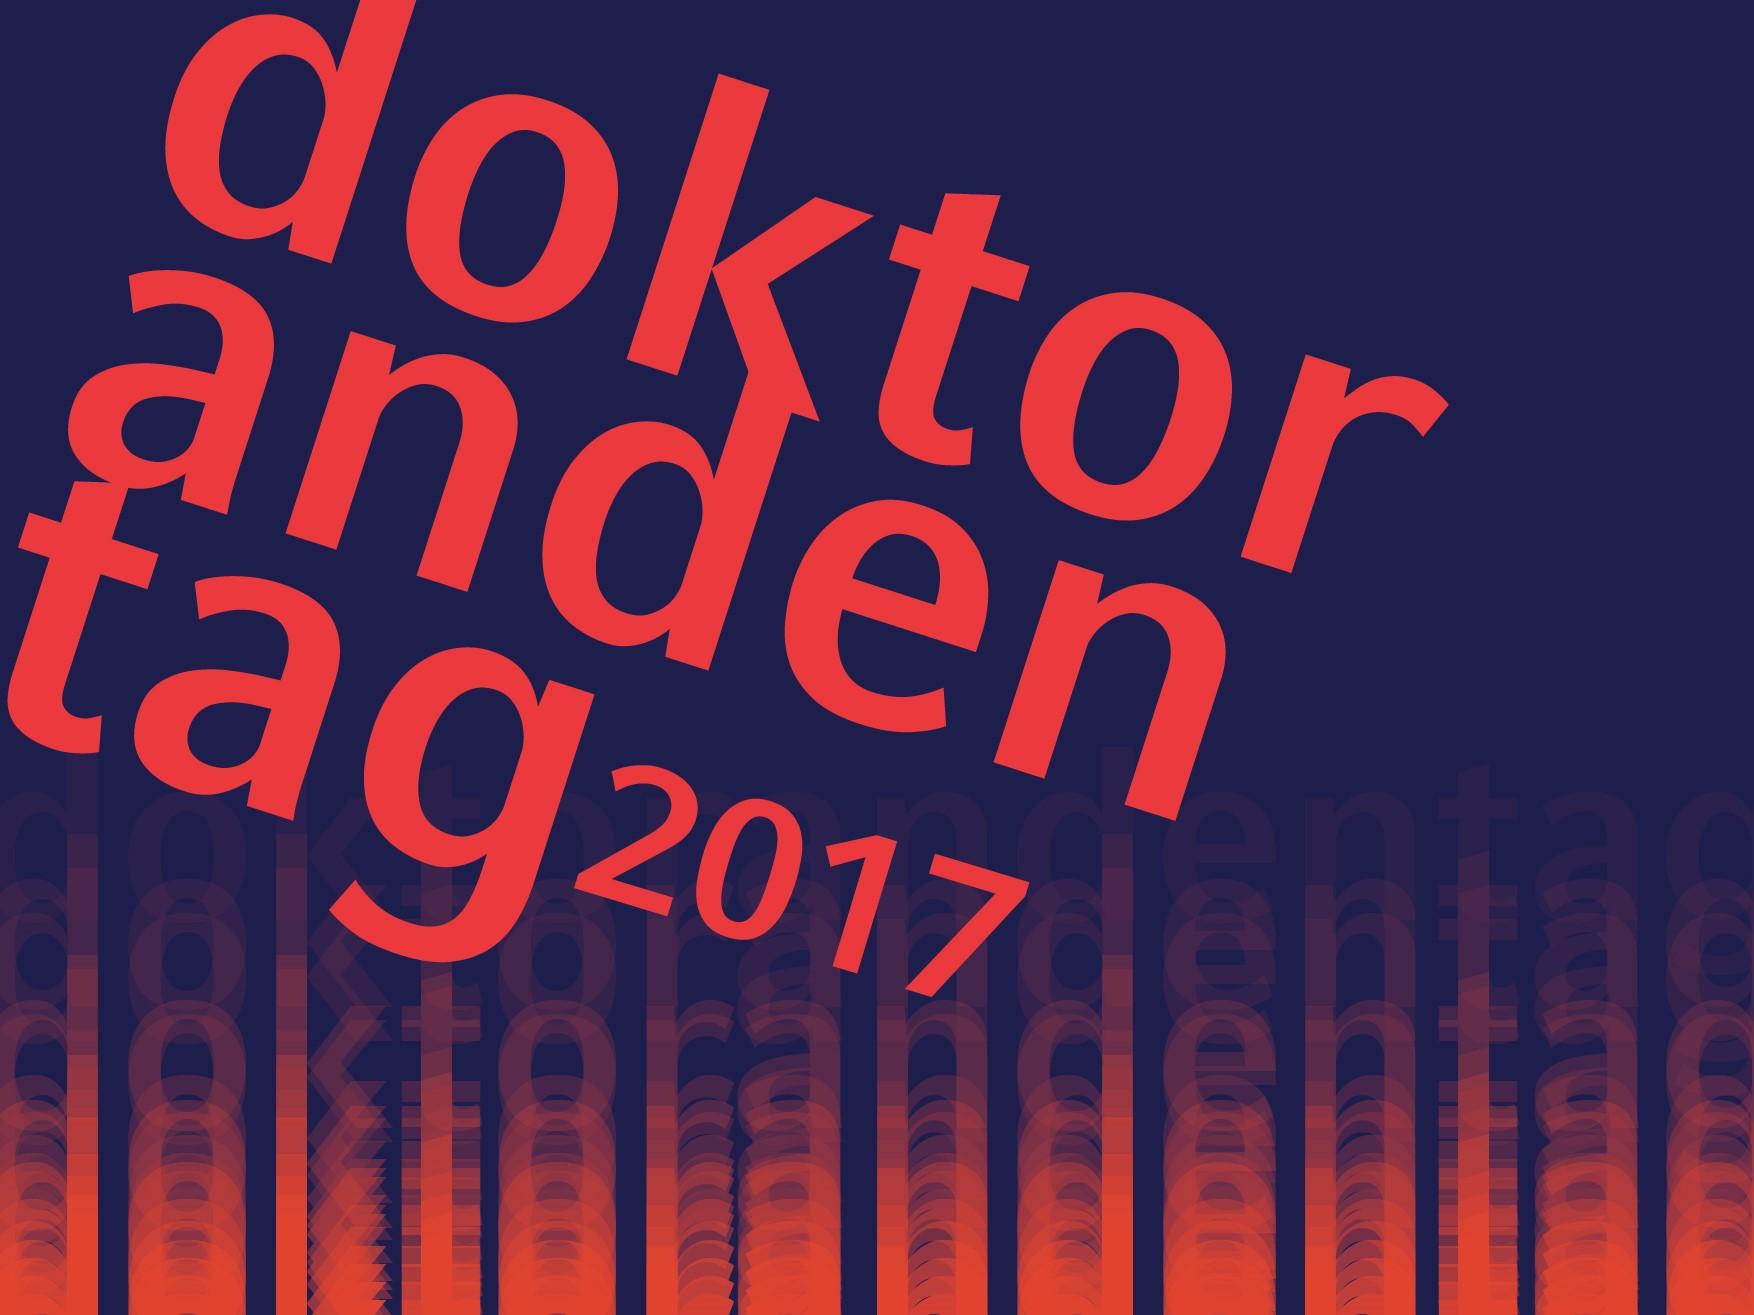 Doktorandentag_2017_logo_web